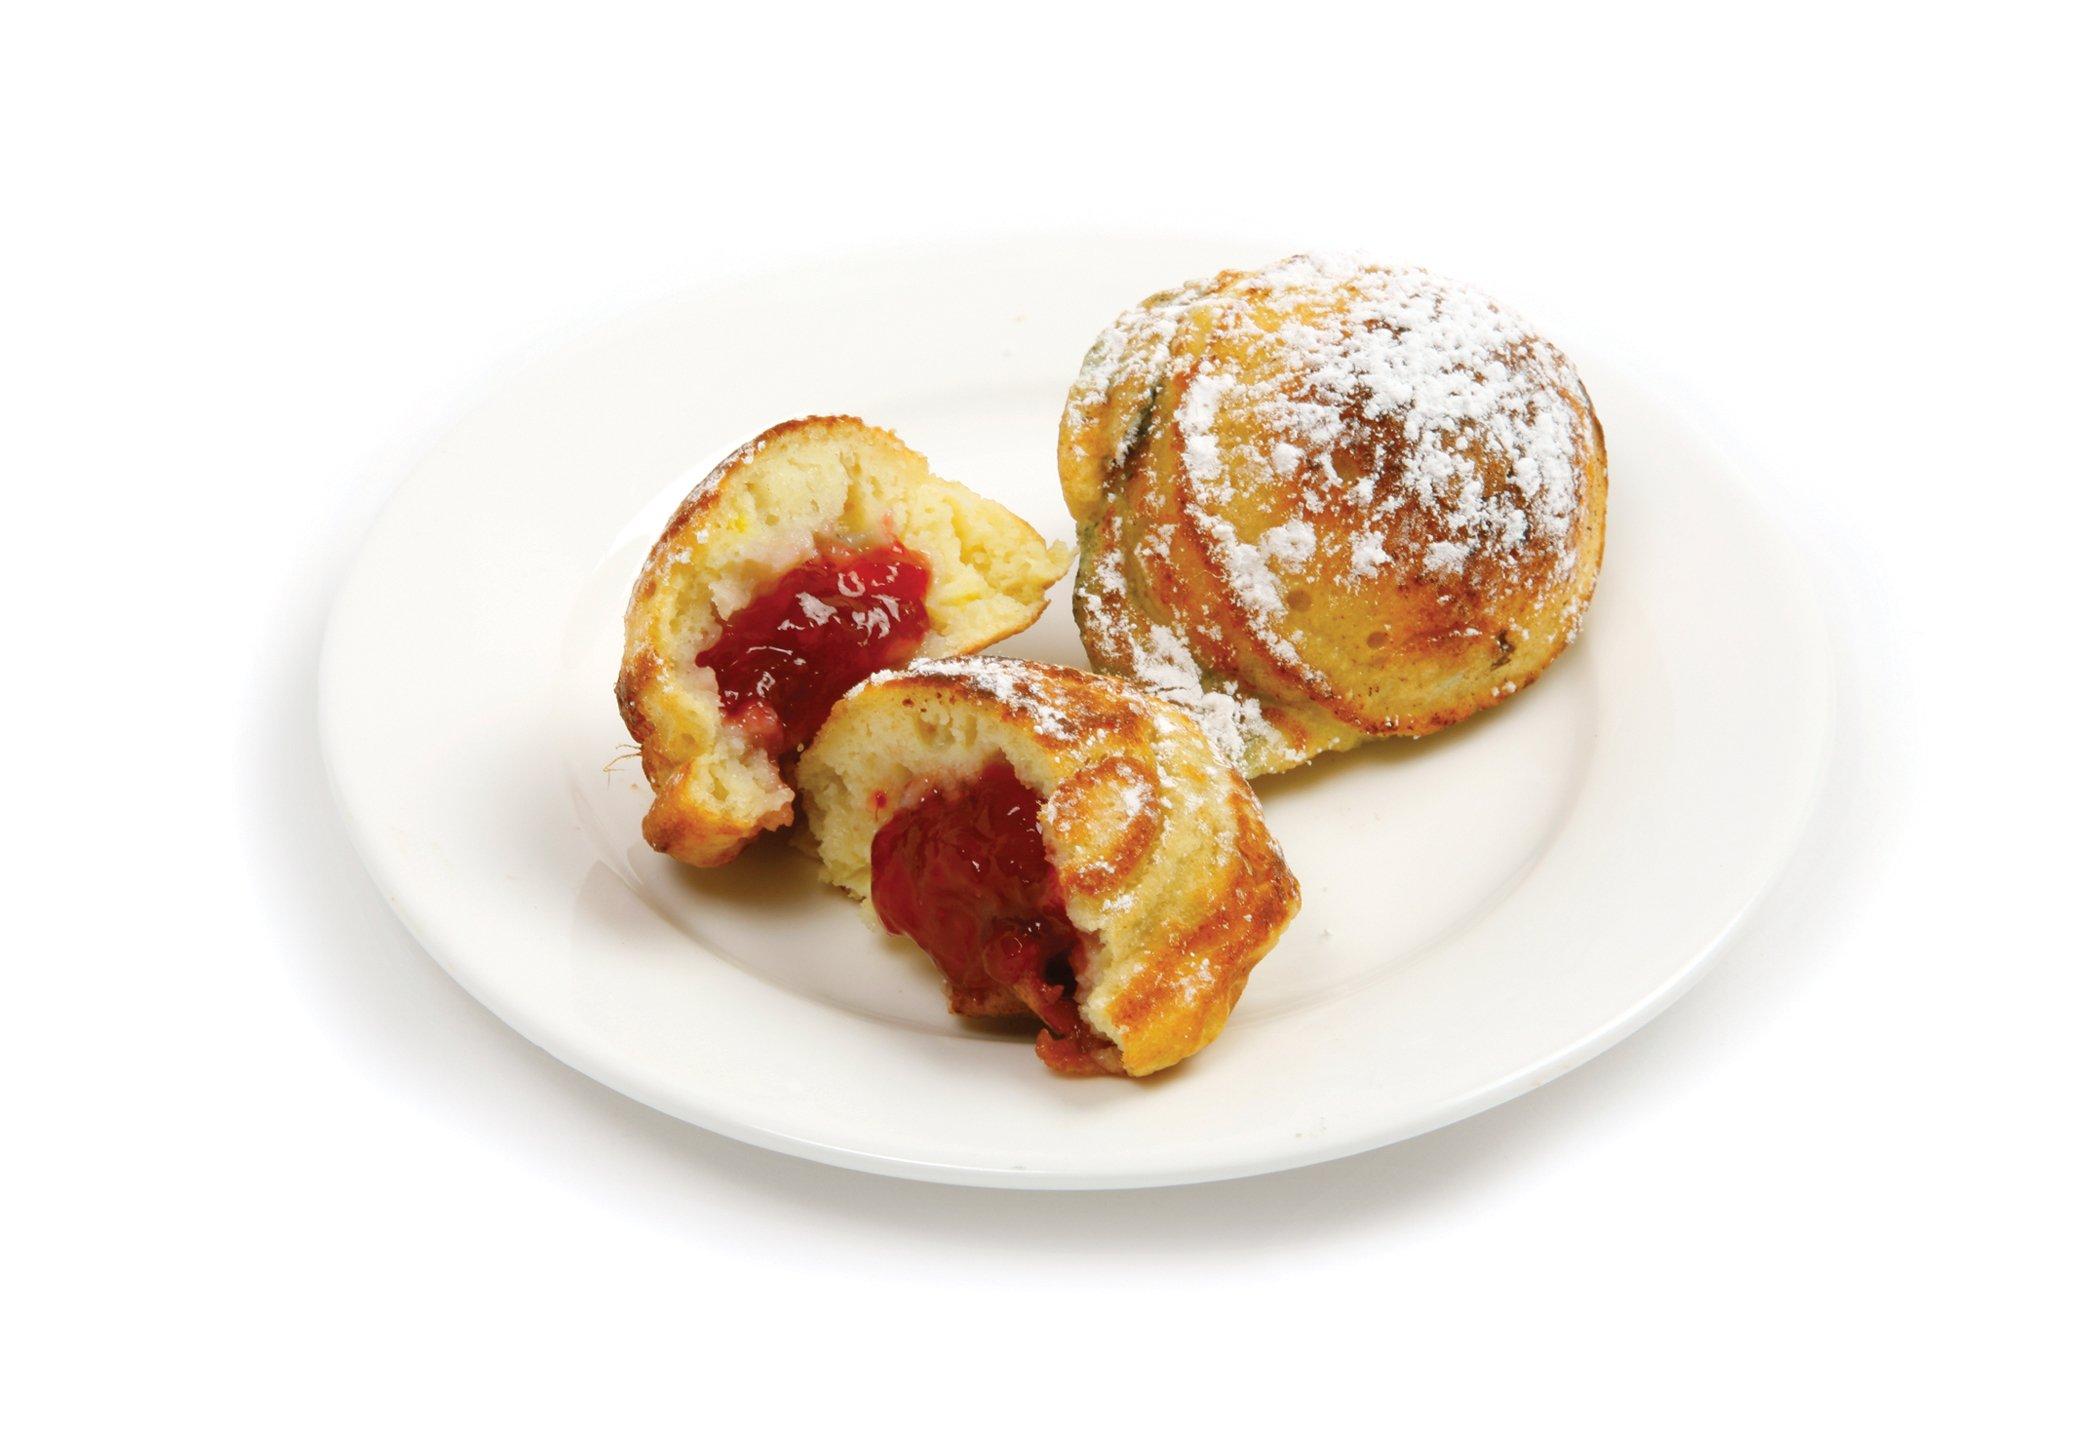 Norpro Nonstick Stuffed Pancake Pan, Munk/Aebleskiver/Ebelskiver